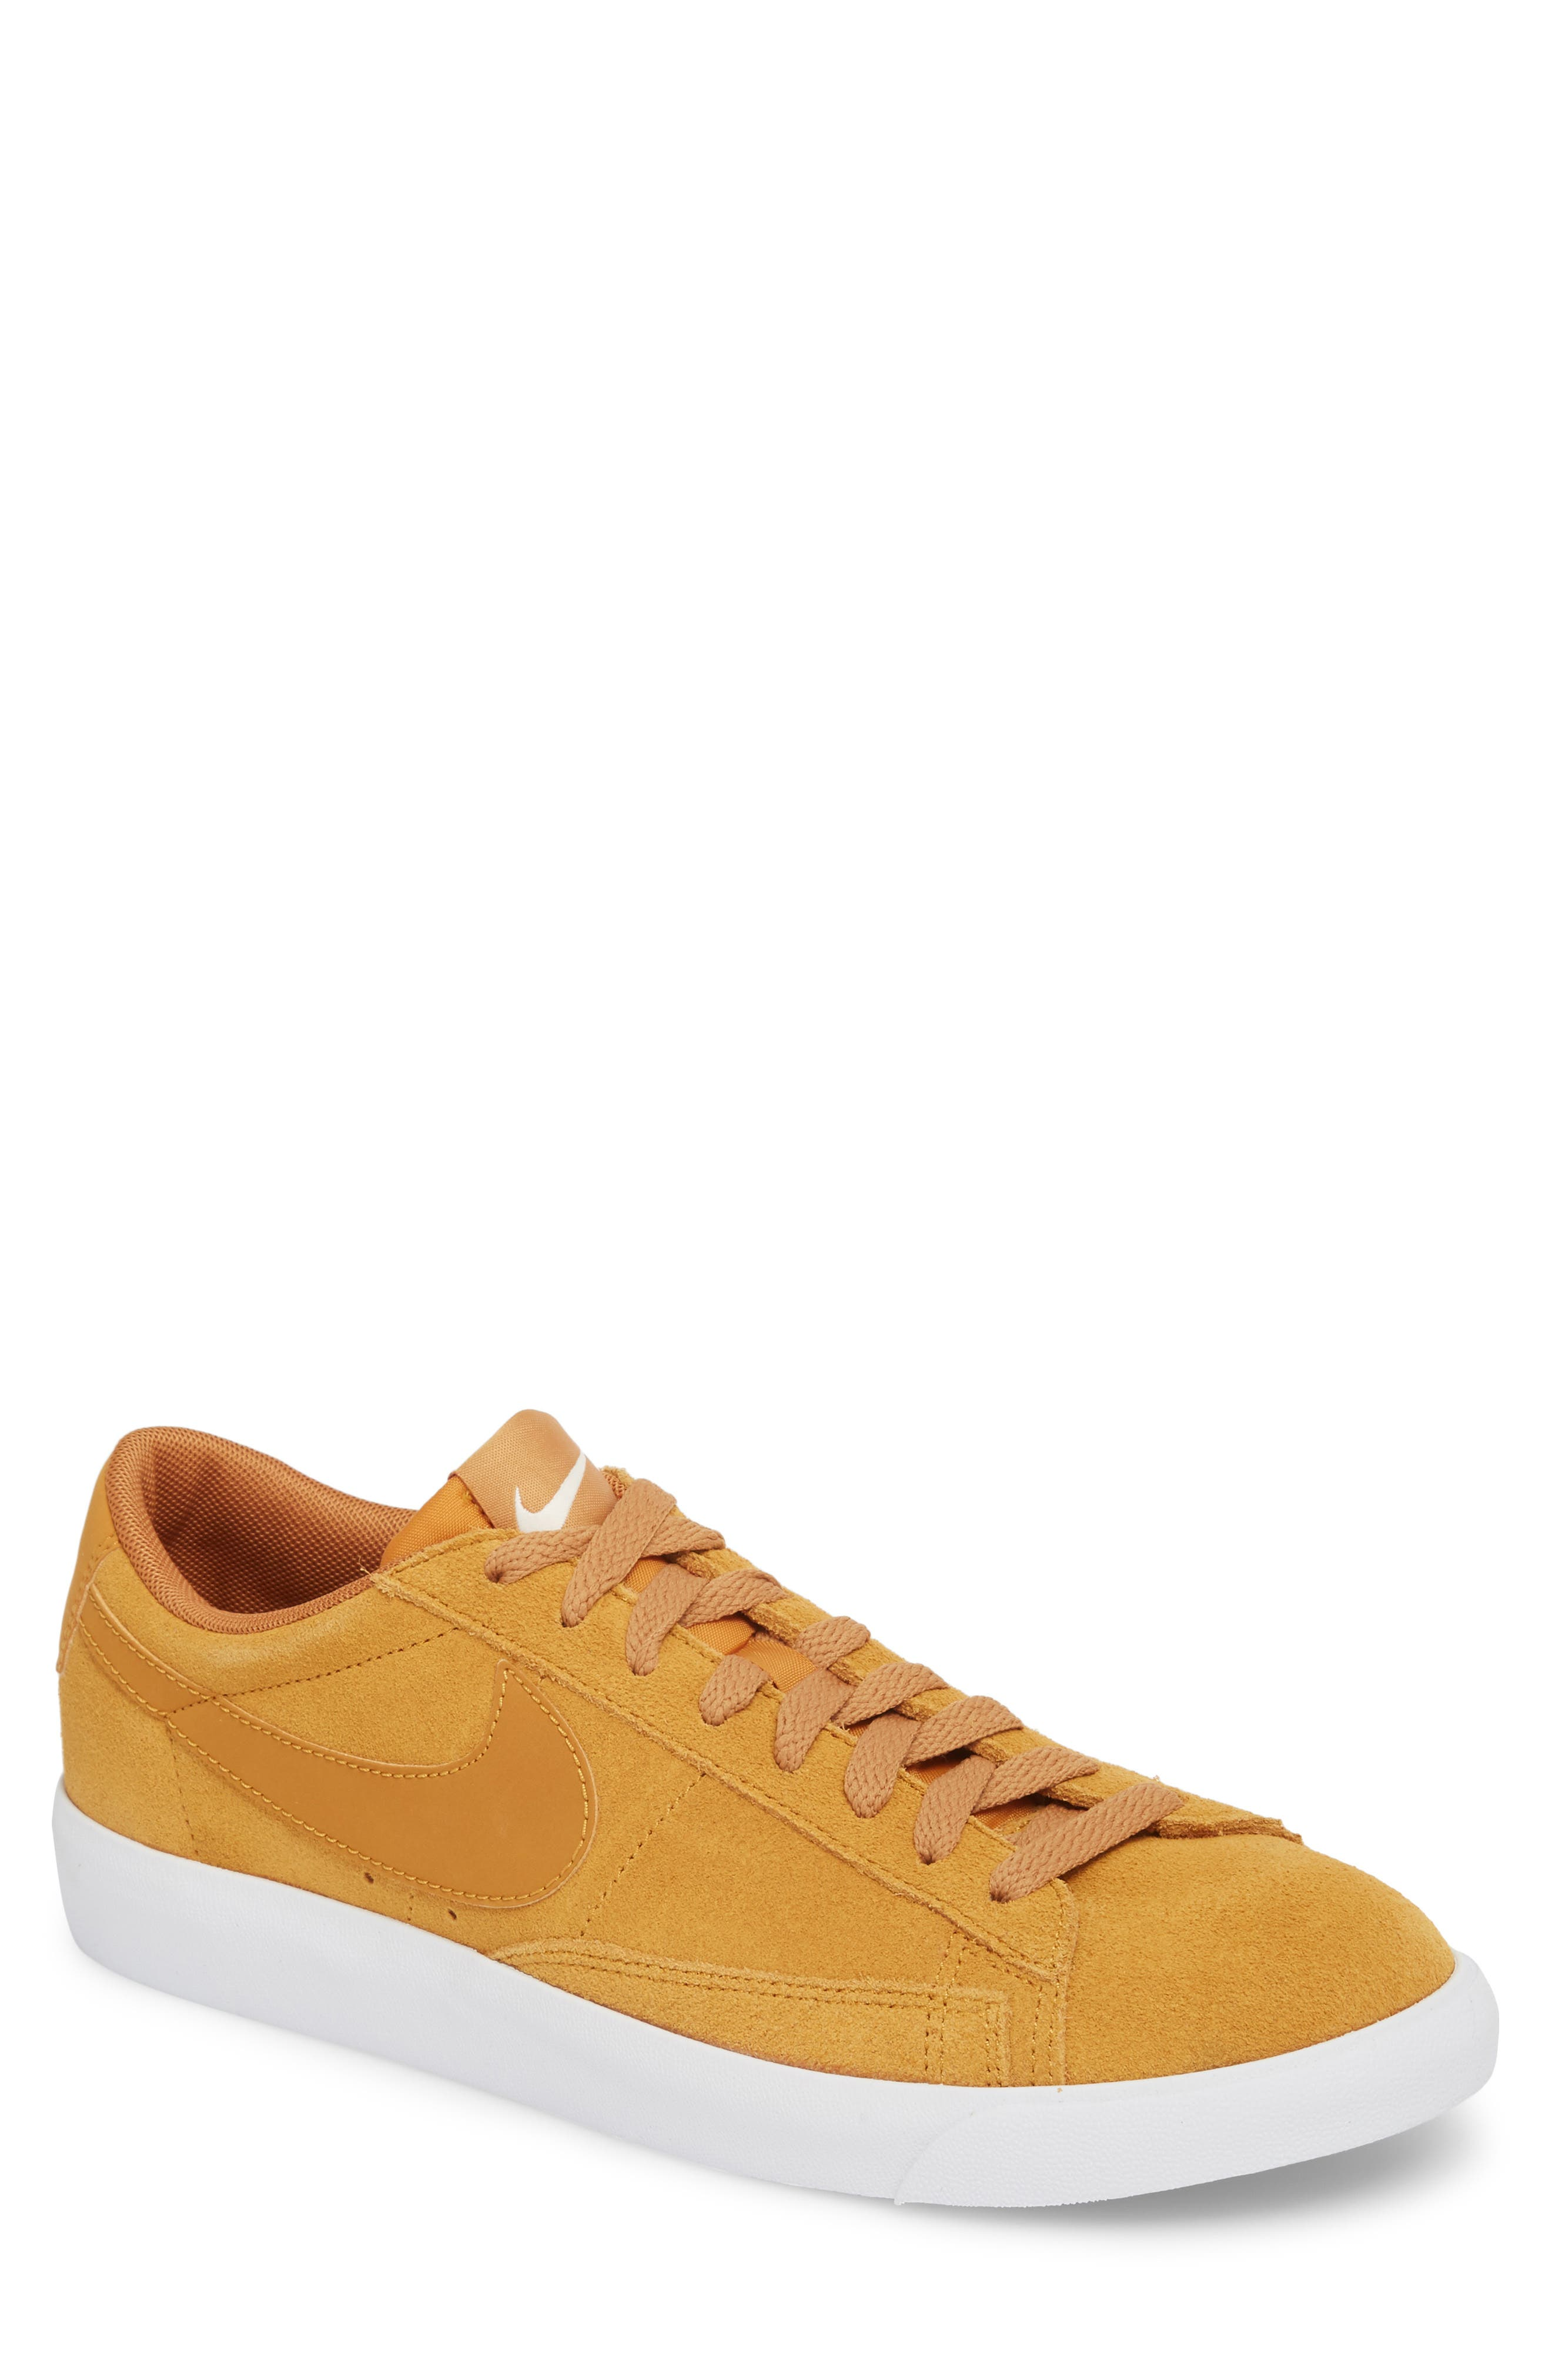 Blazer Low Suede Sneaker,                             Main thumbnail 1, color,                             260